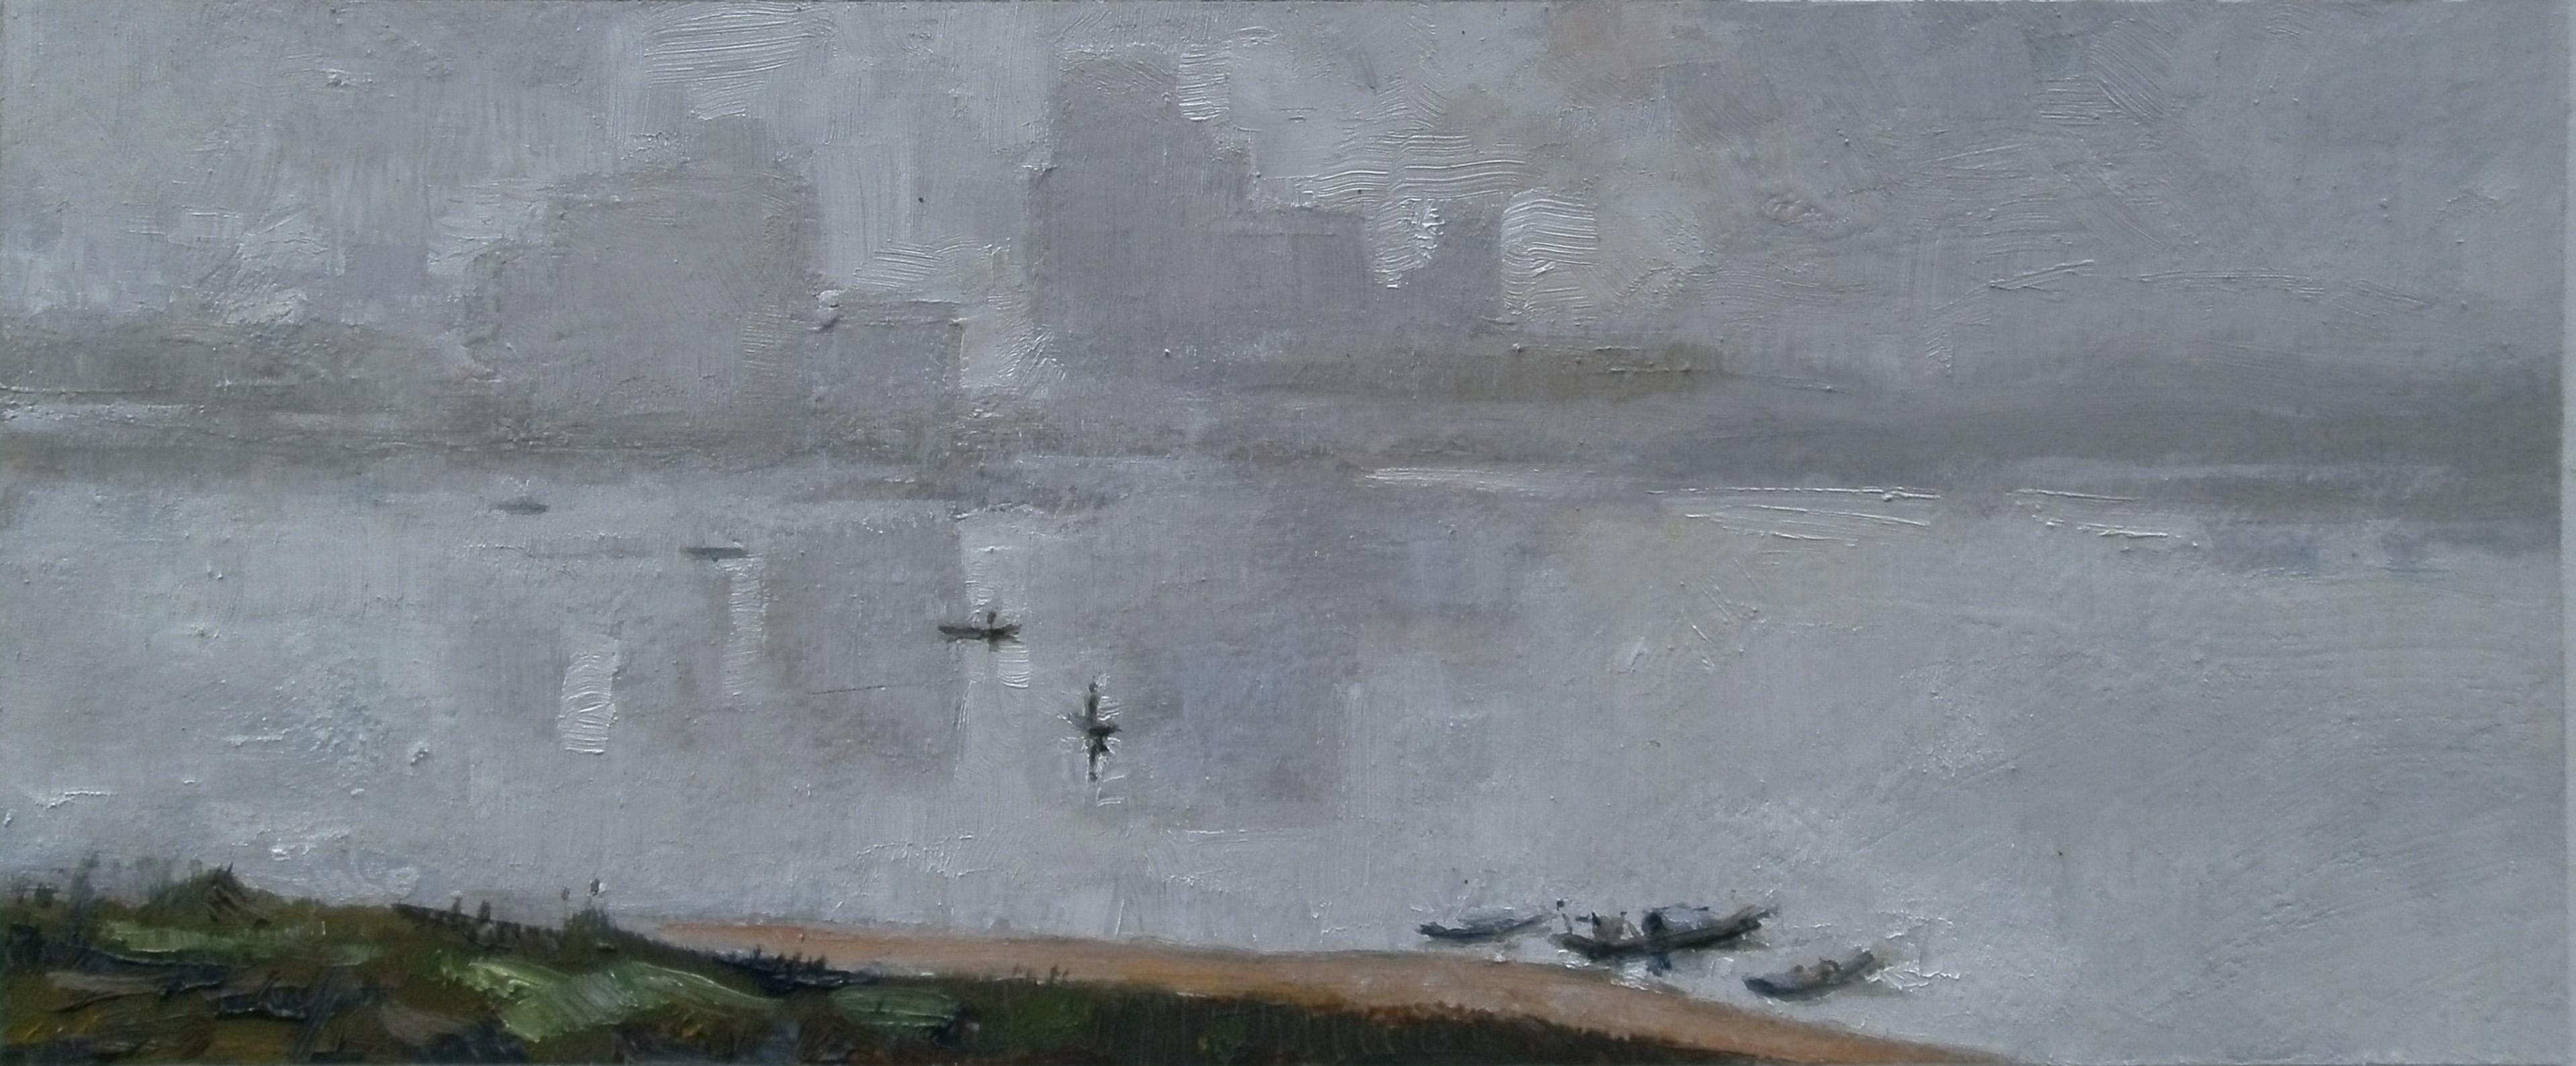 雾锁湘江(插图)